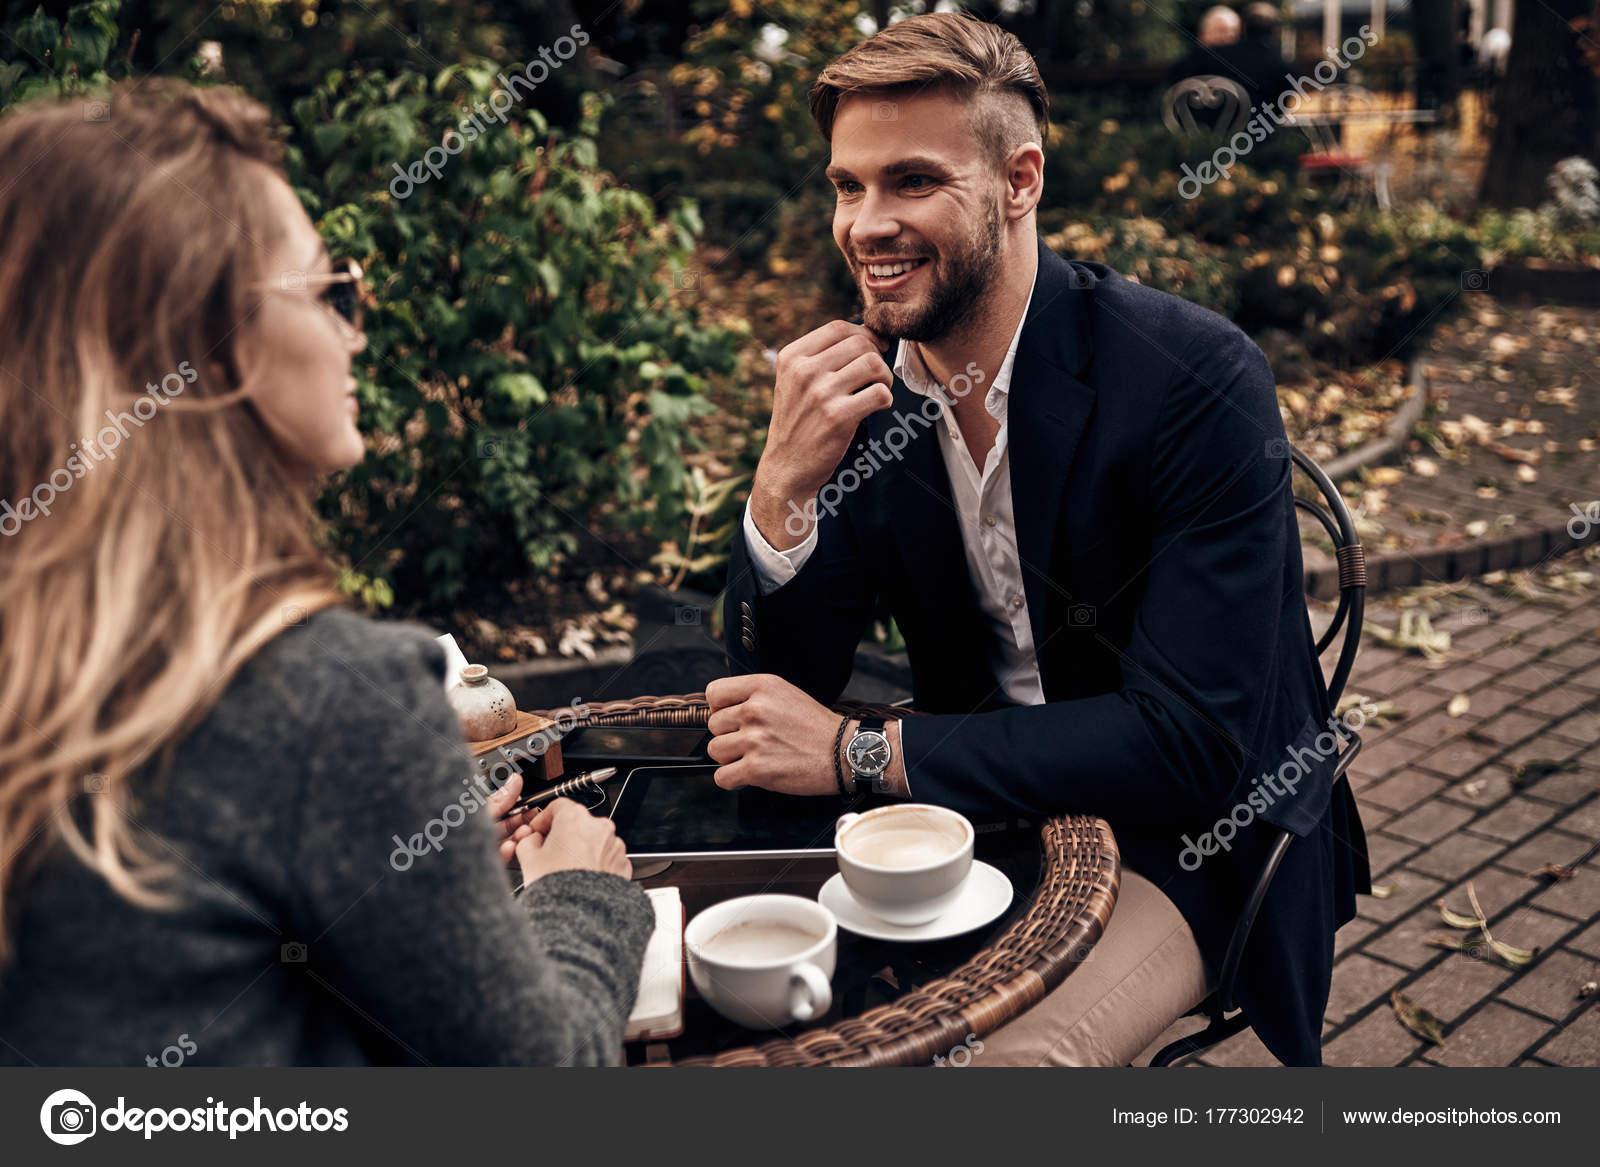 handsome young man having conversation woman restaurant job interview stock photo